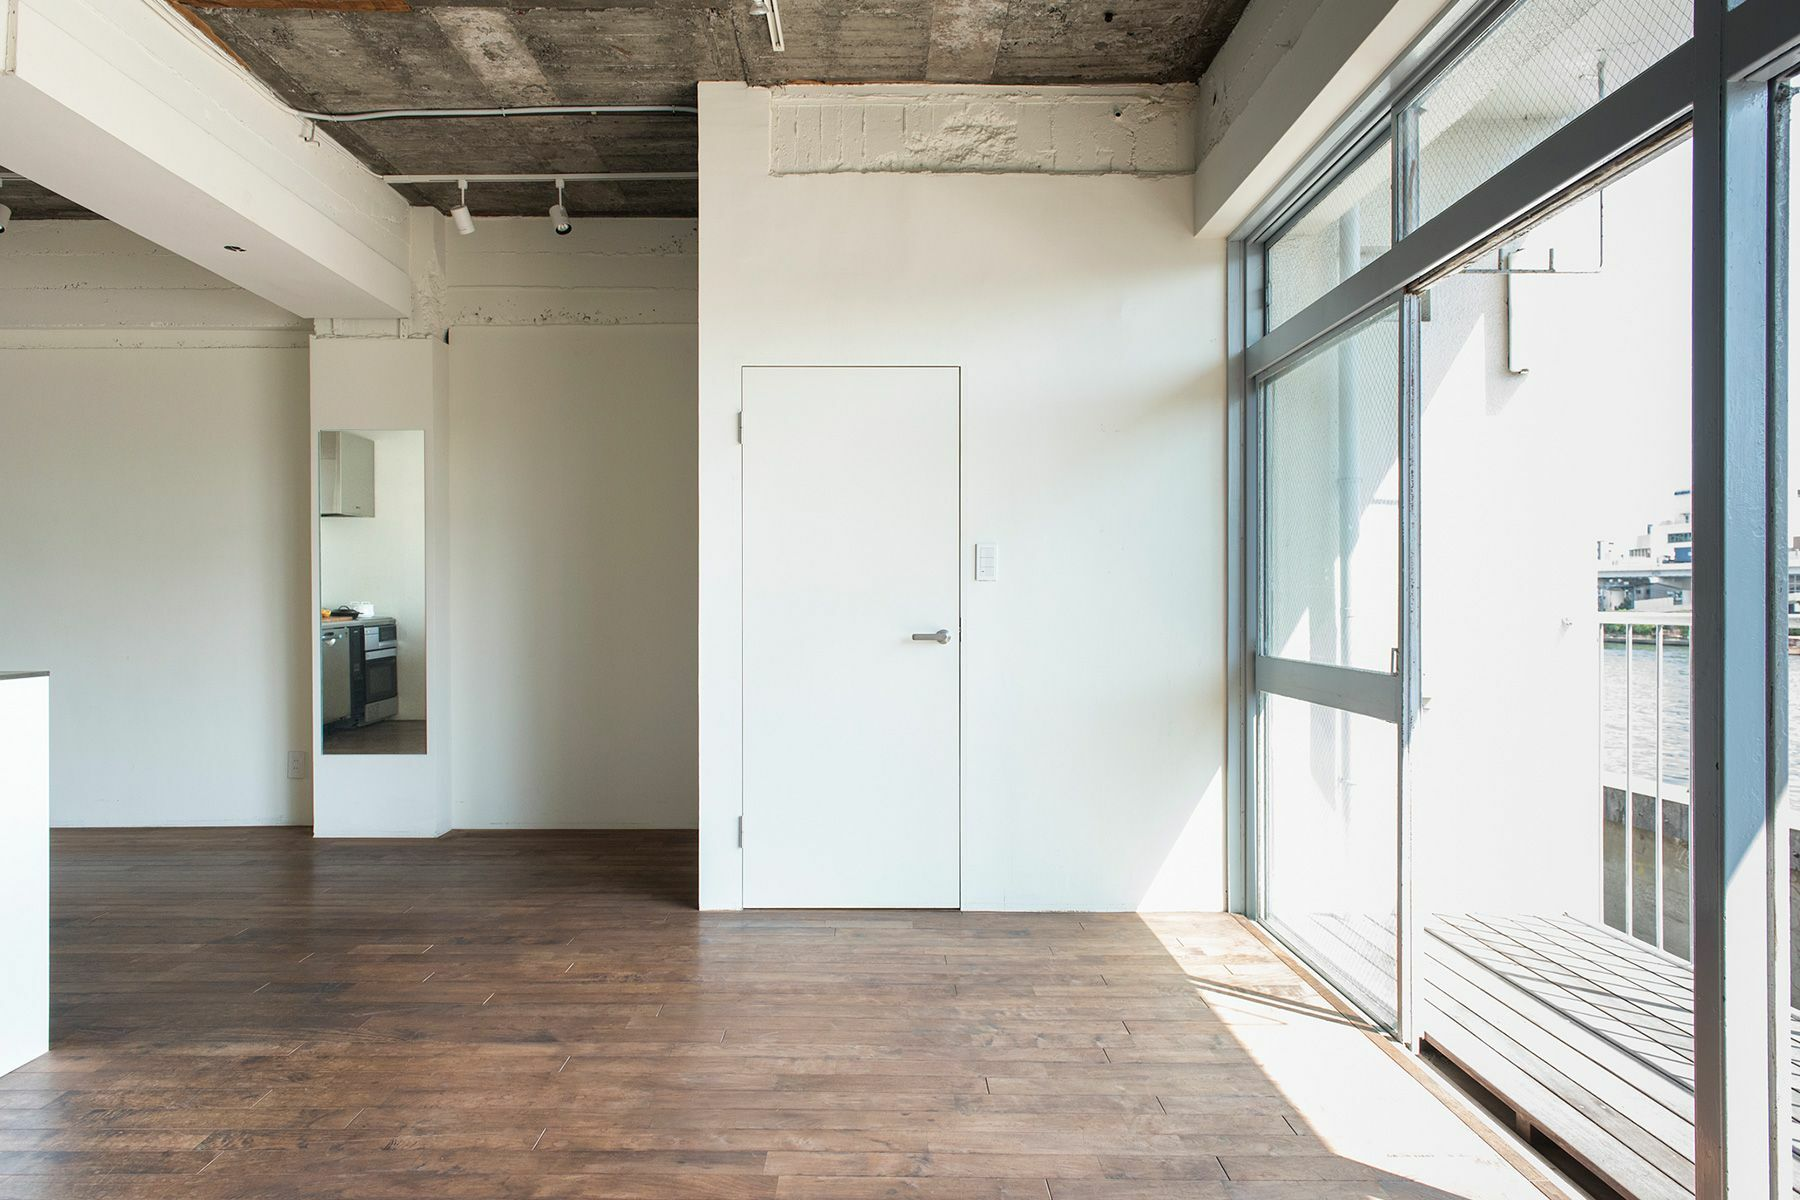 cobaco kitchen(コバコ キッチン)明るい室内